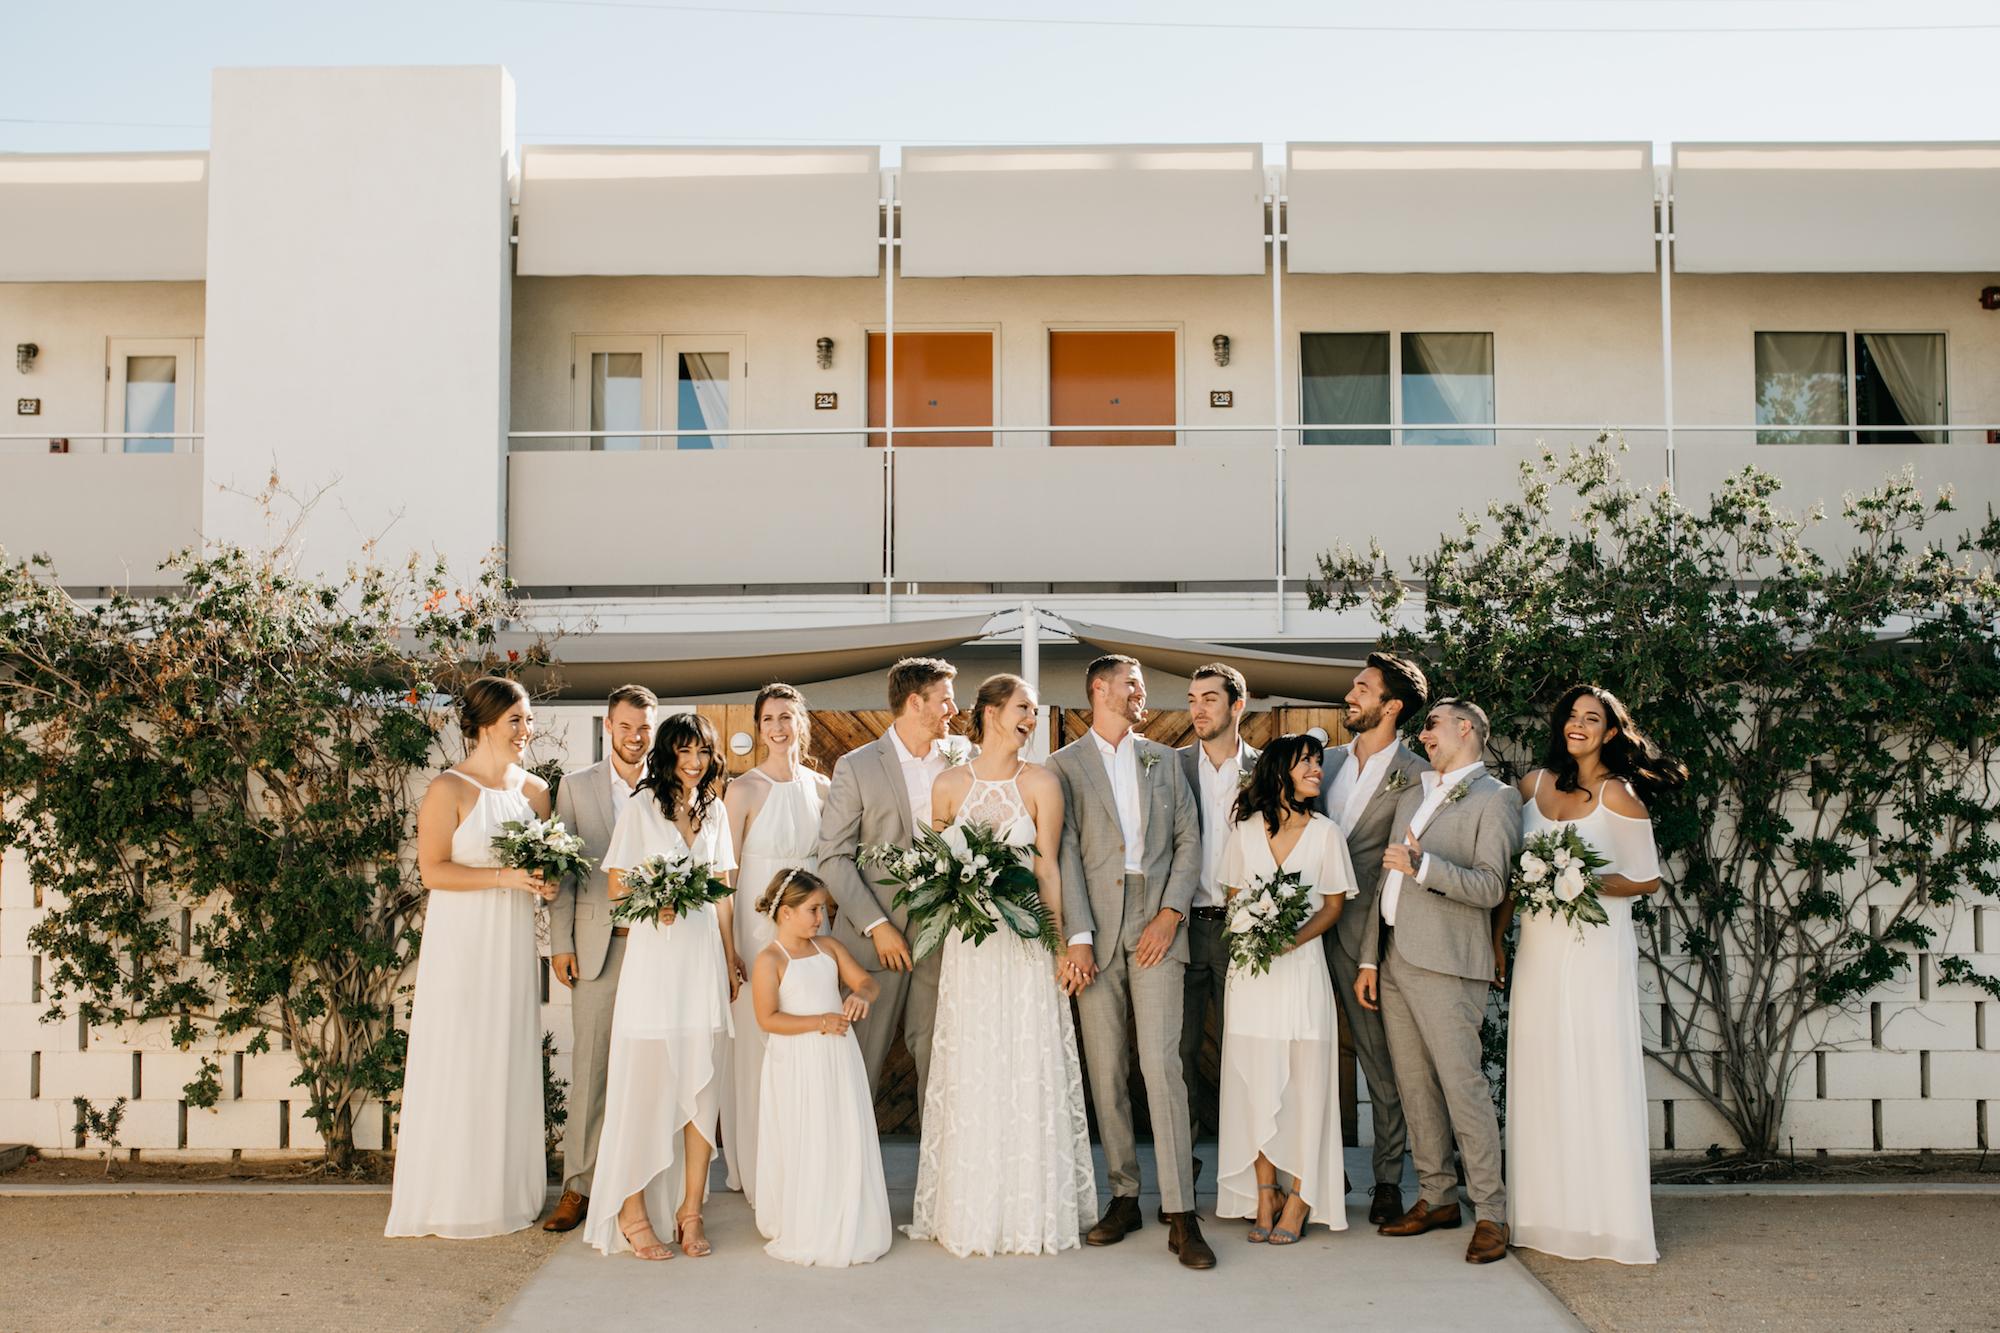 ace-hotel-palm-springs-wedding-photographer318.jpg